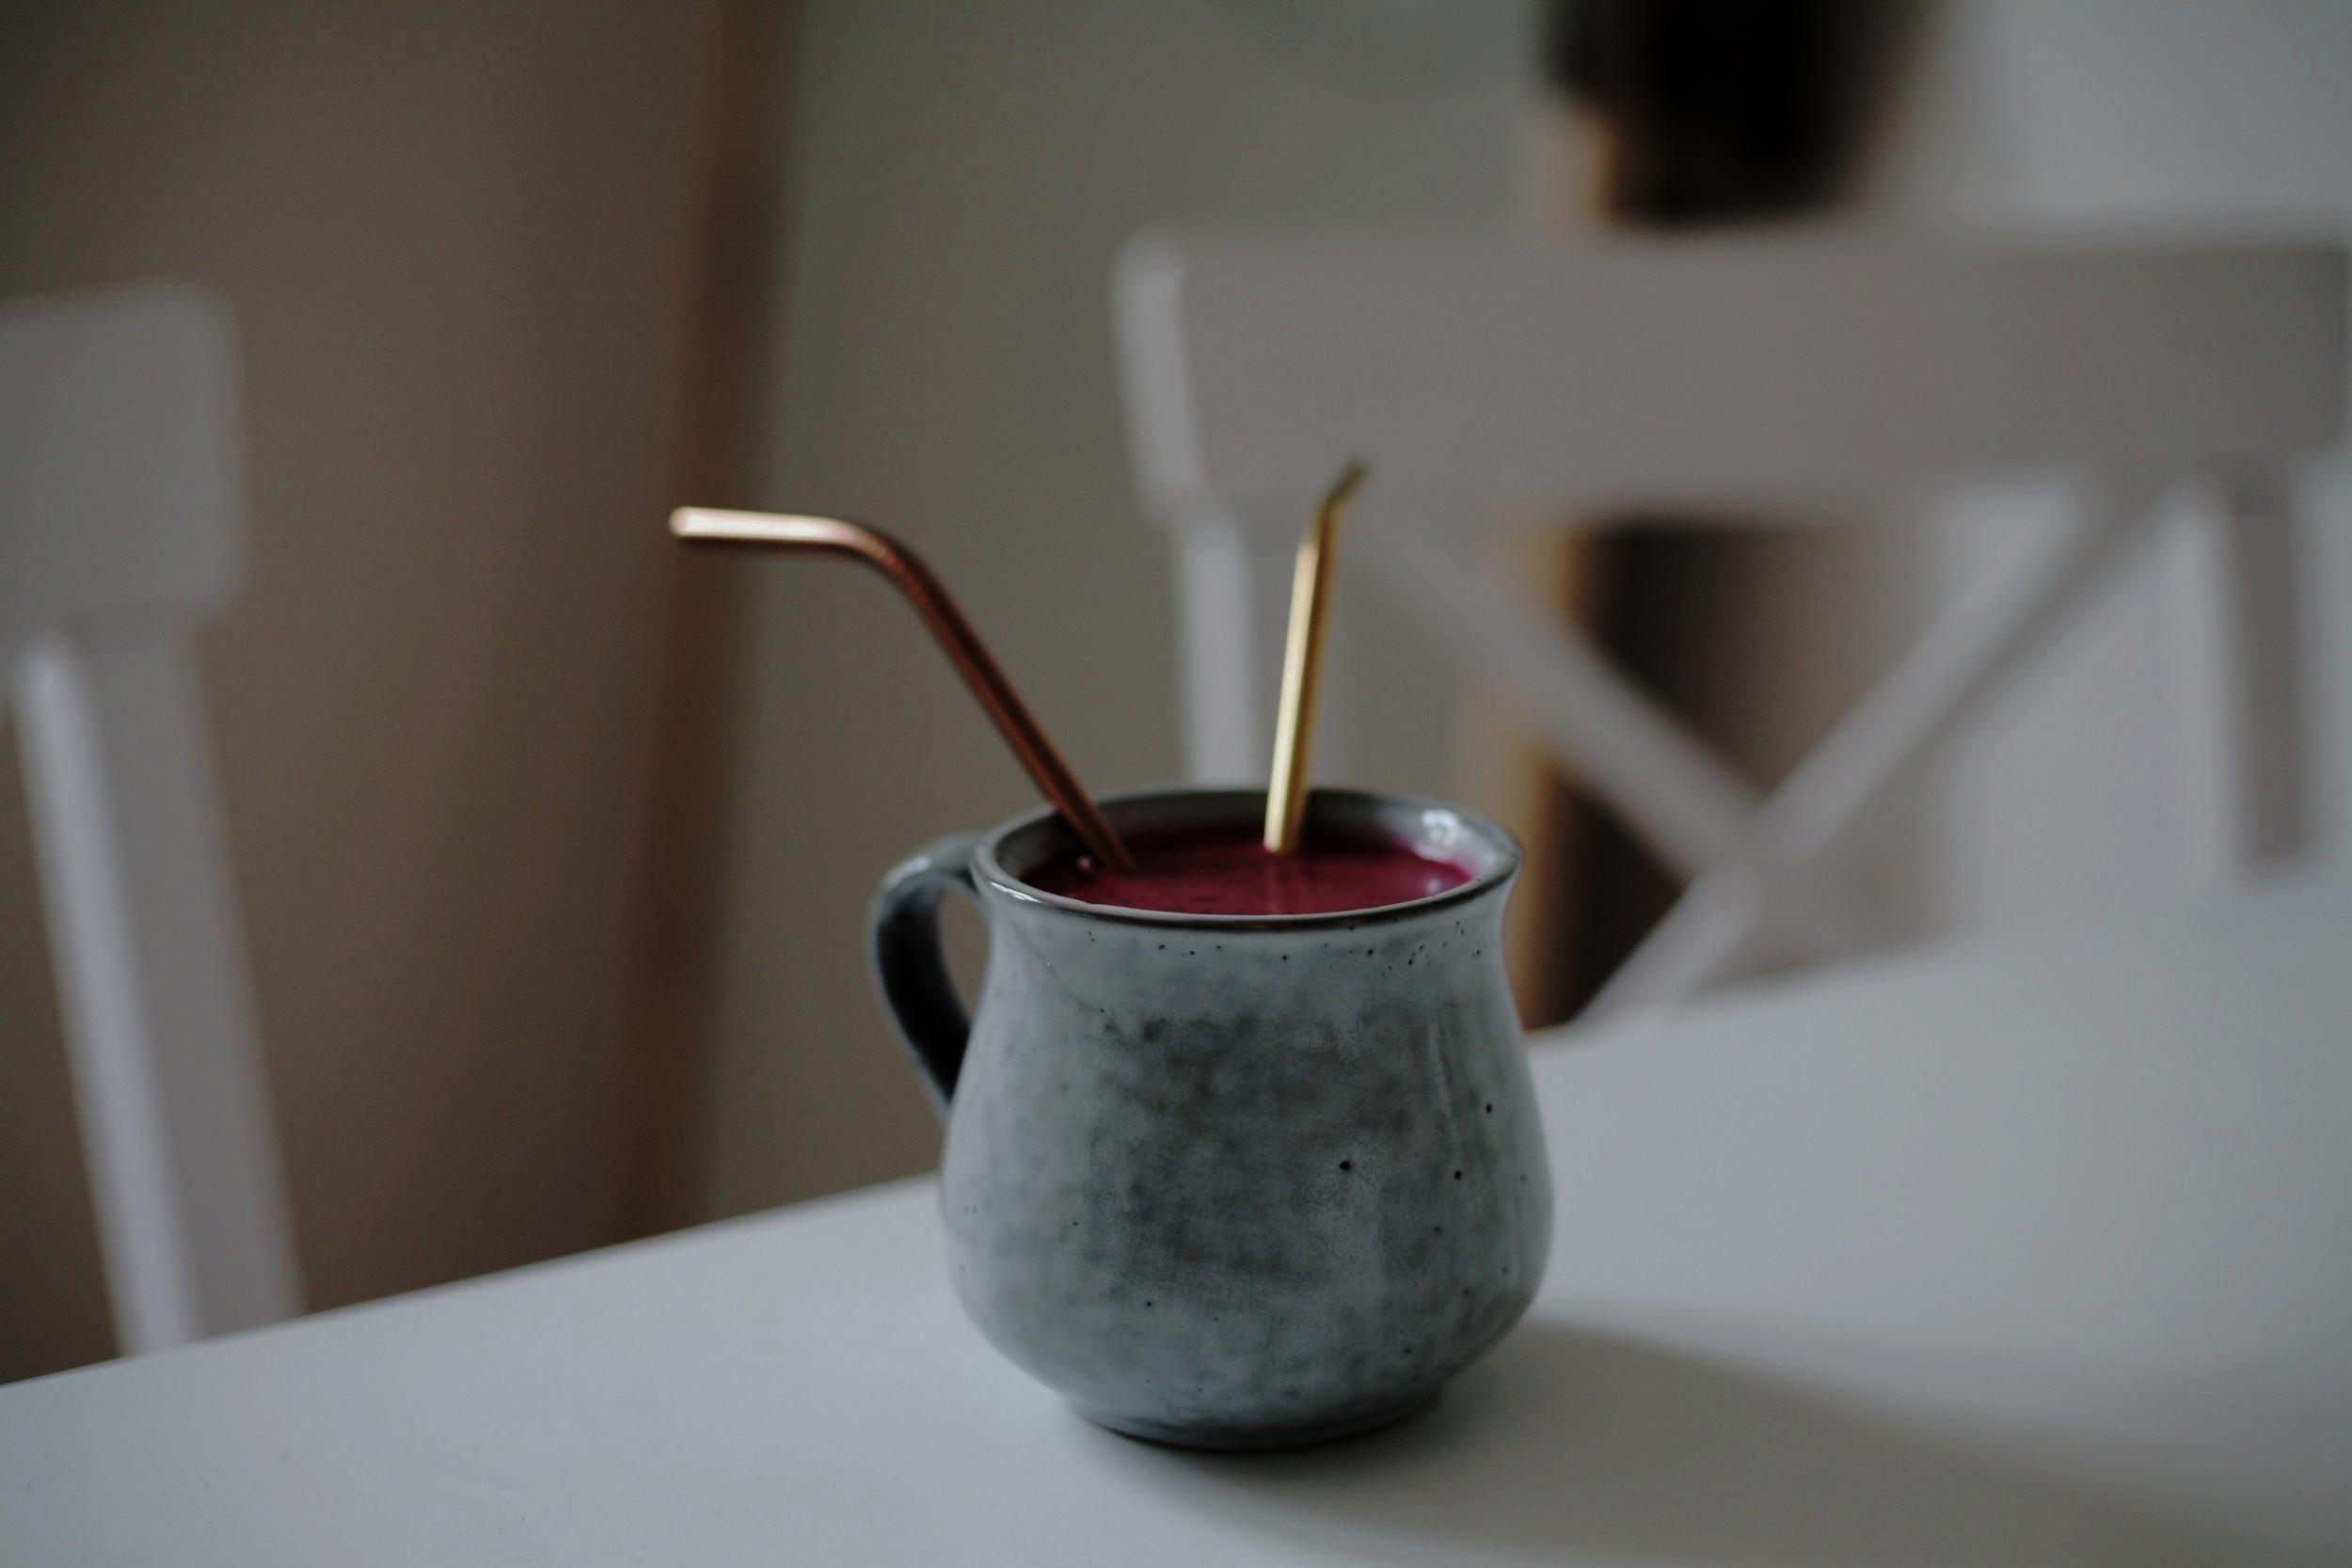 beverage-blur-ceramic-cup-893907.jpg